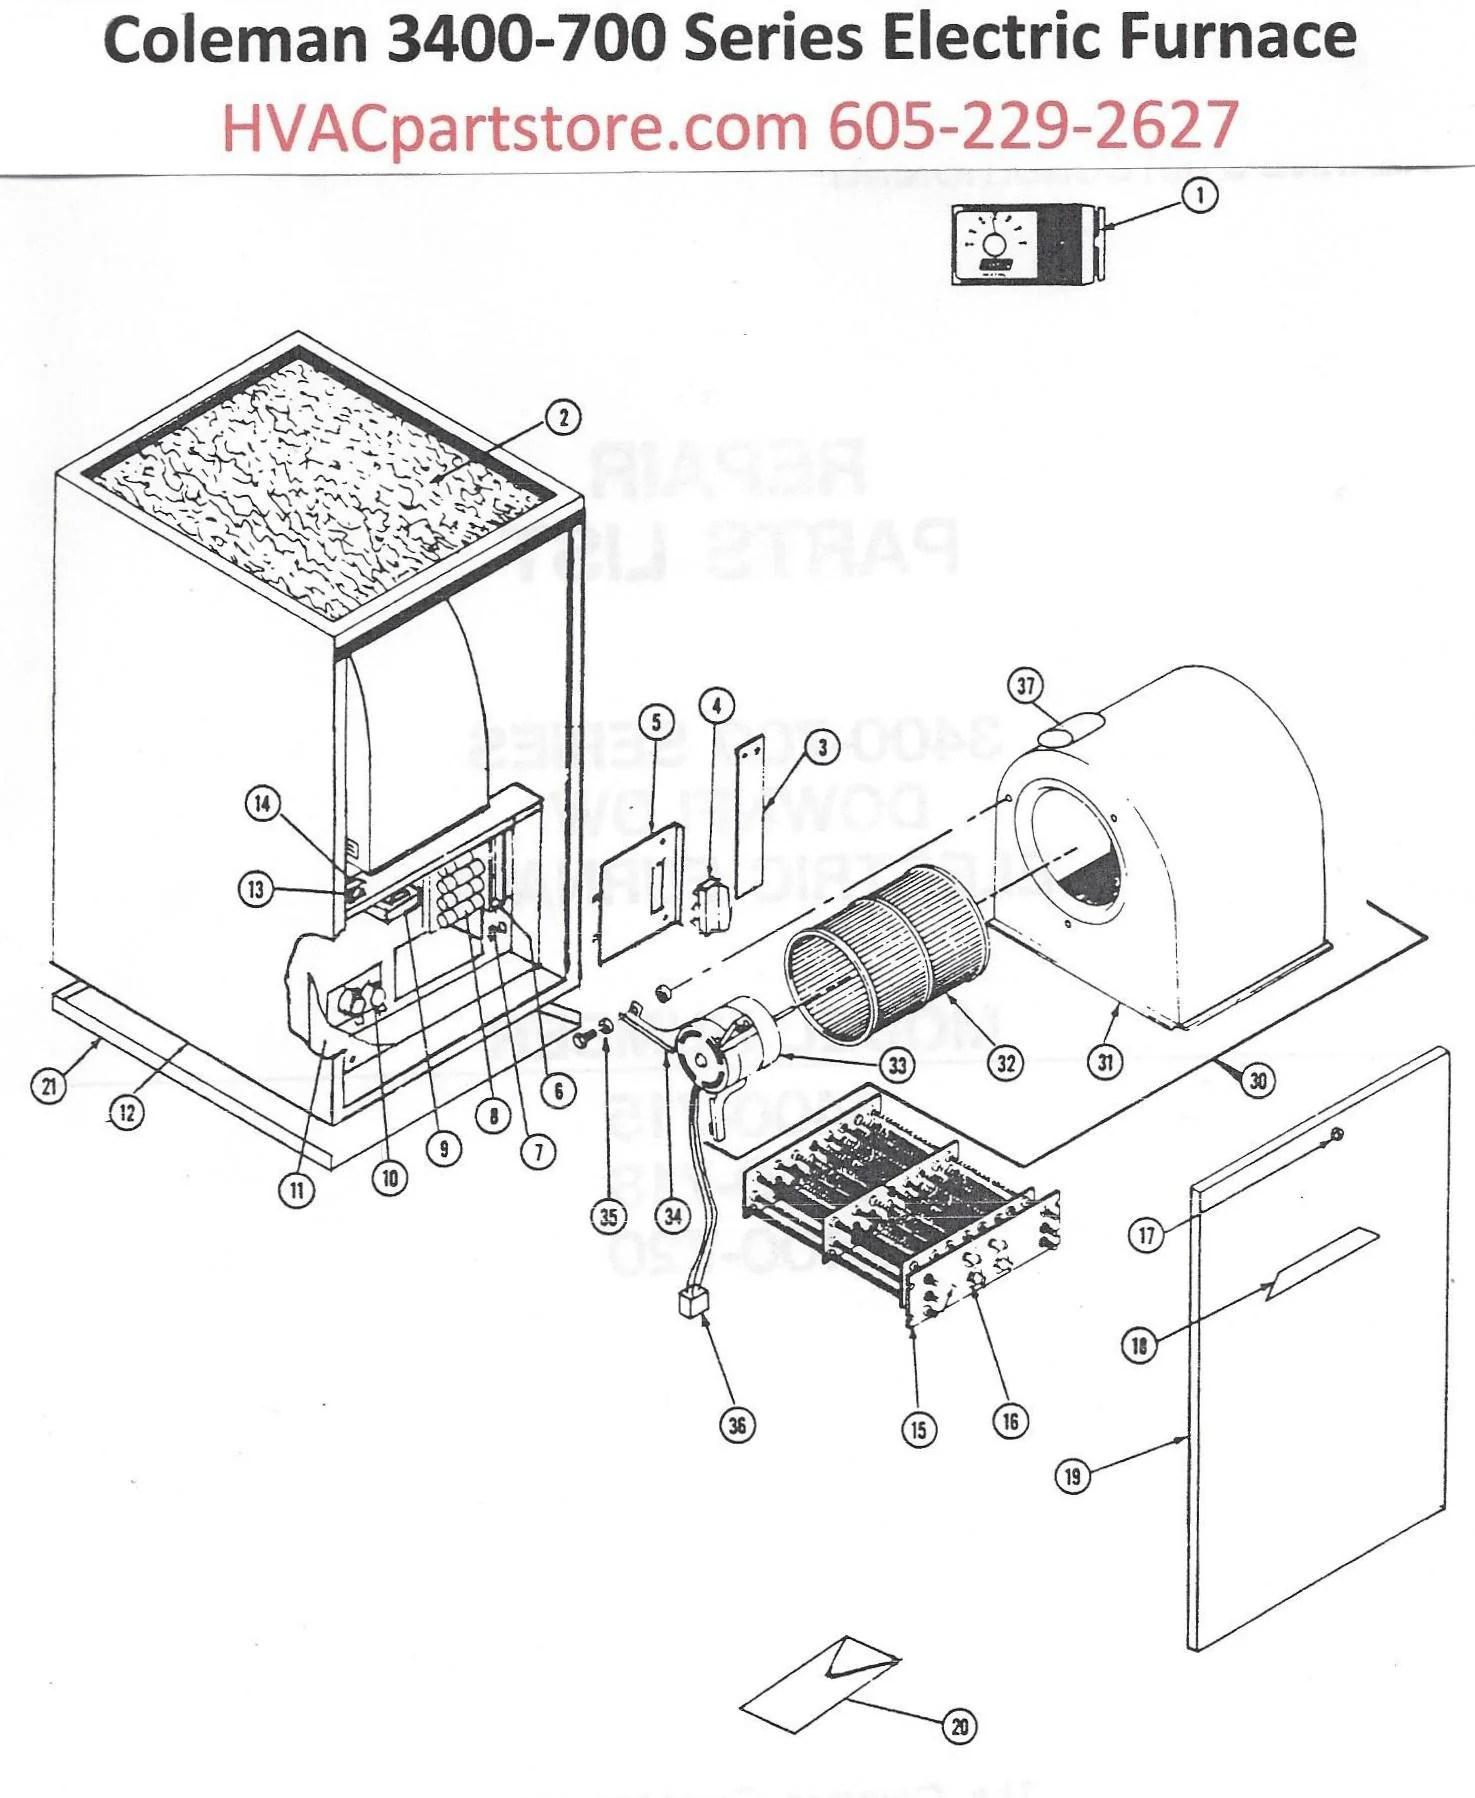 hight resolution of  3400 7seriesdiagram 38bc13bf b5f6 4ac4 866d 4d7929750e12 electric furnace wiring diagrams e2eb 015hb dolgular com intertherm e2eb